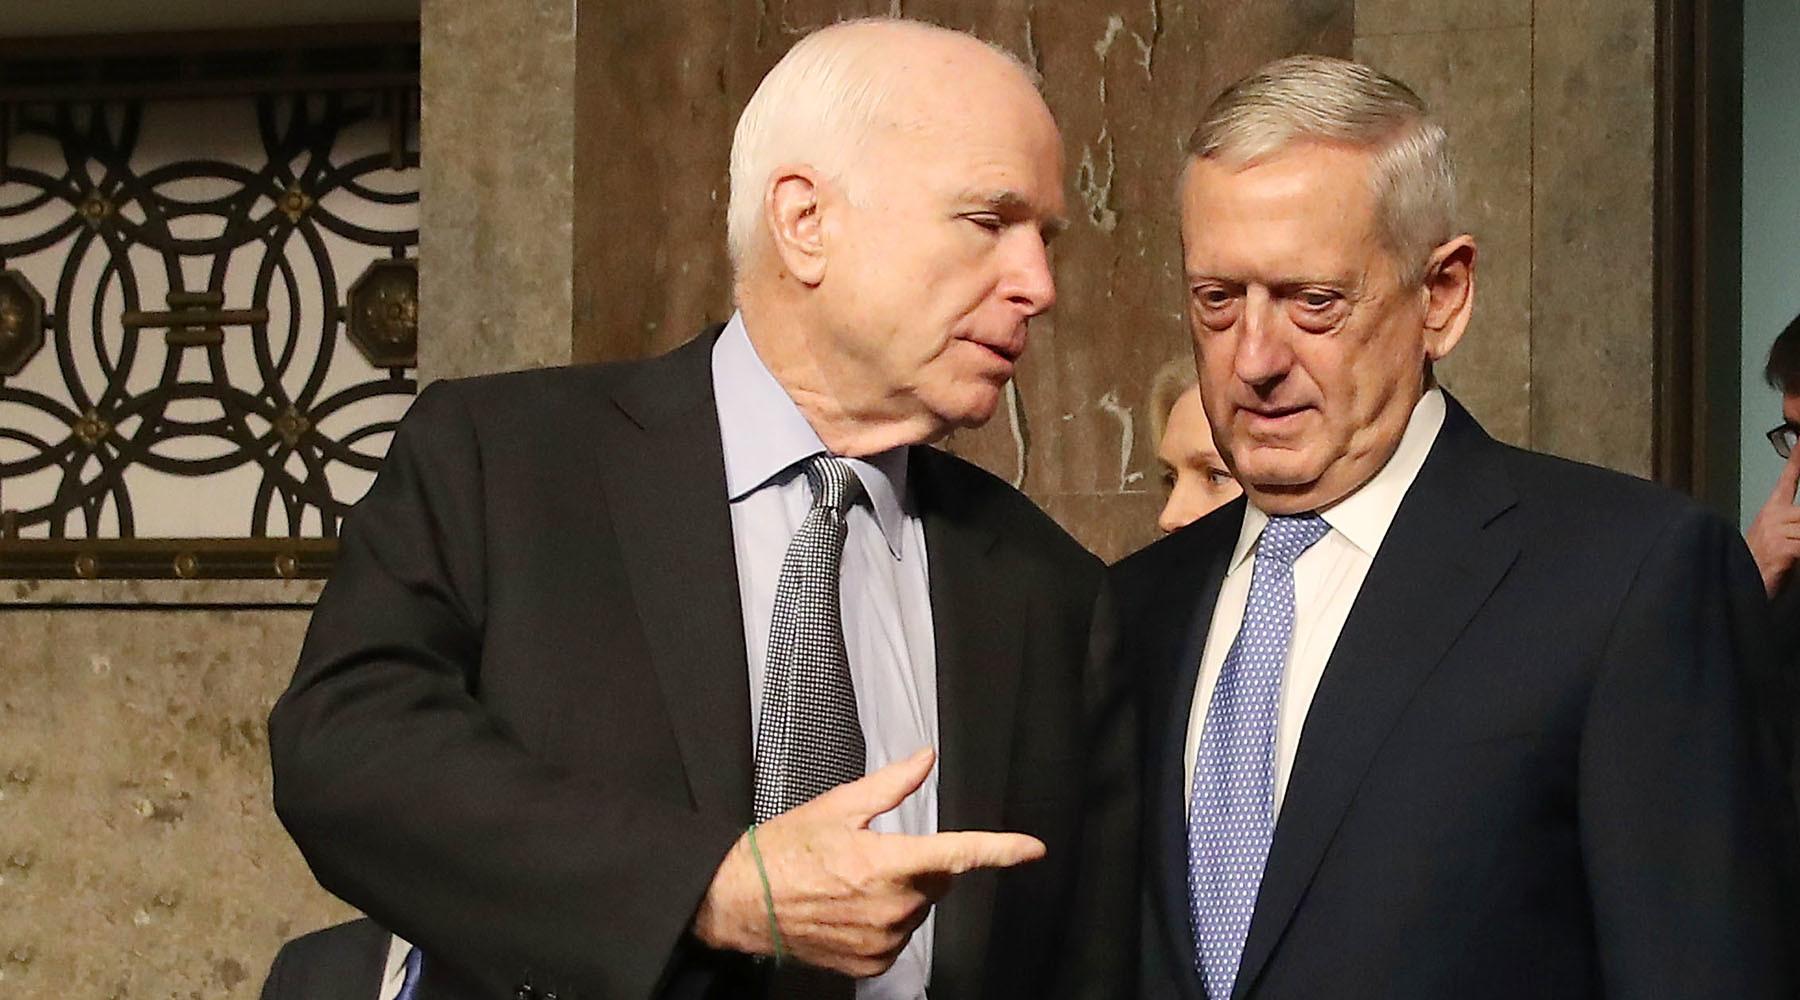 США хотят преподнести подарок Украине